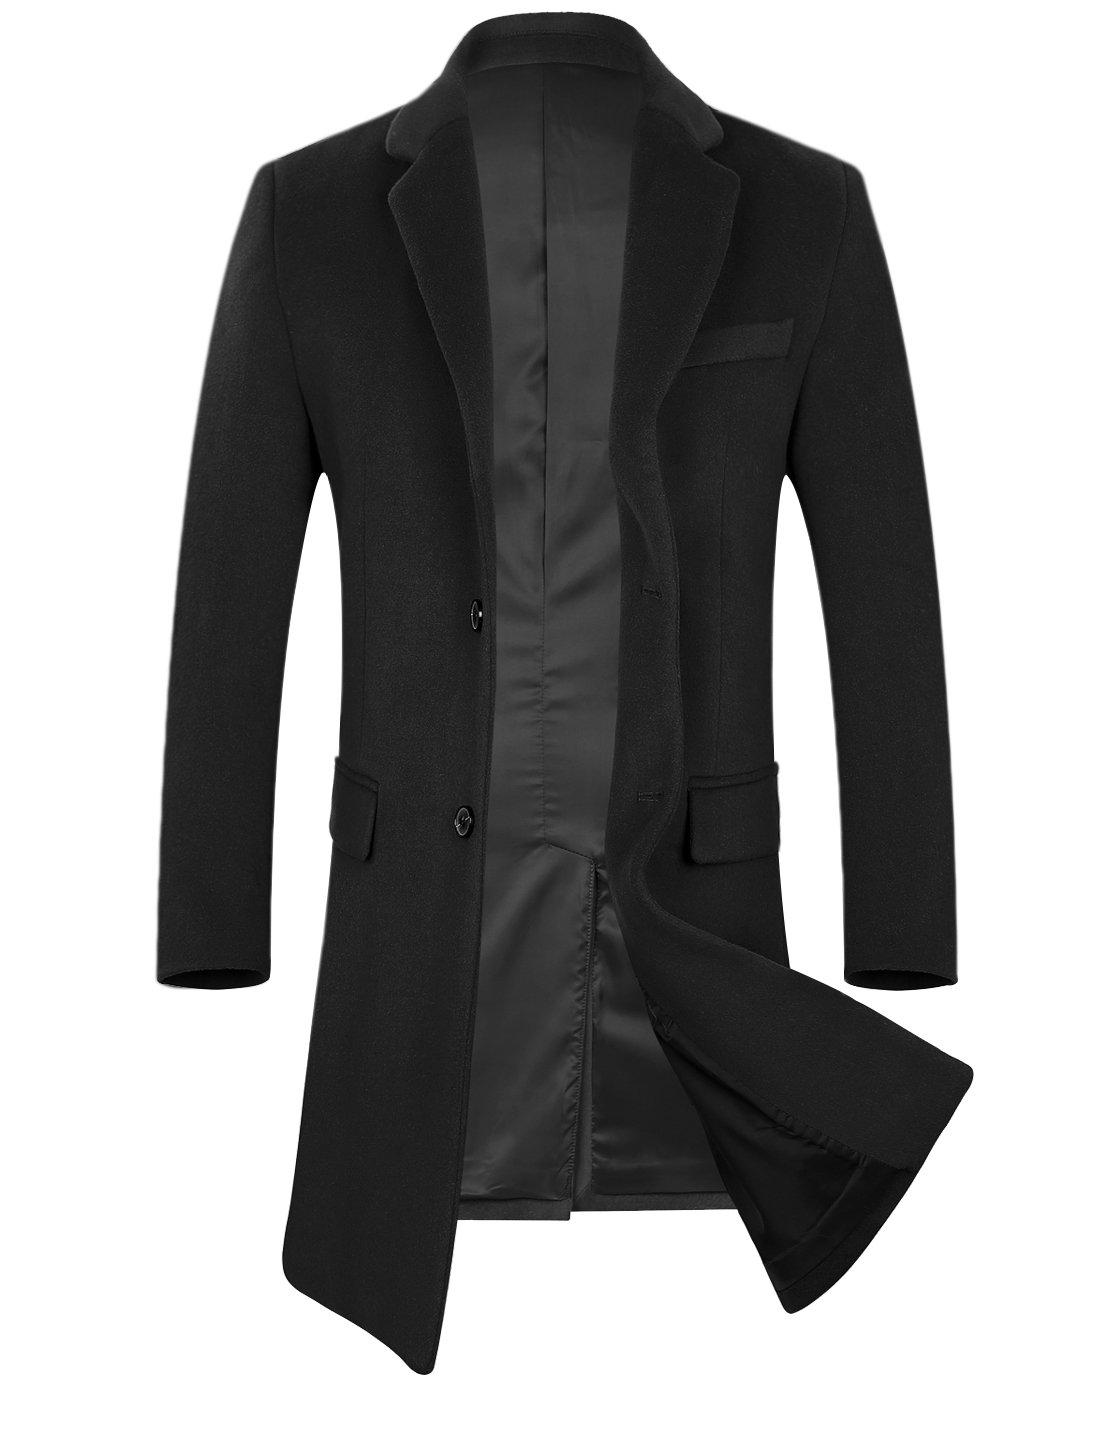 APTRO Men's Wool Coat Long Fashion Slim Fit Overcoat Jacket 1702 Black XL by APTRO